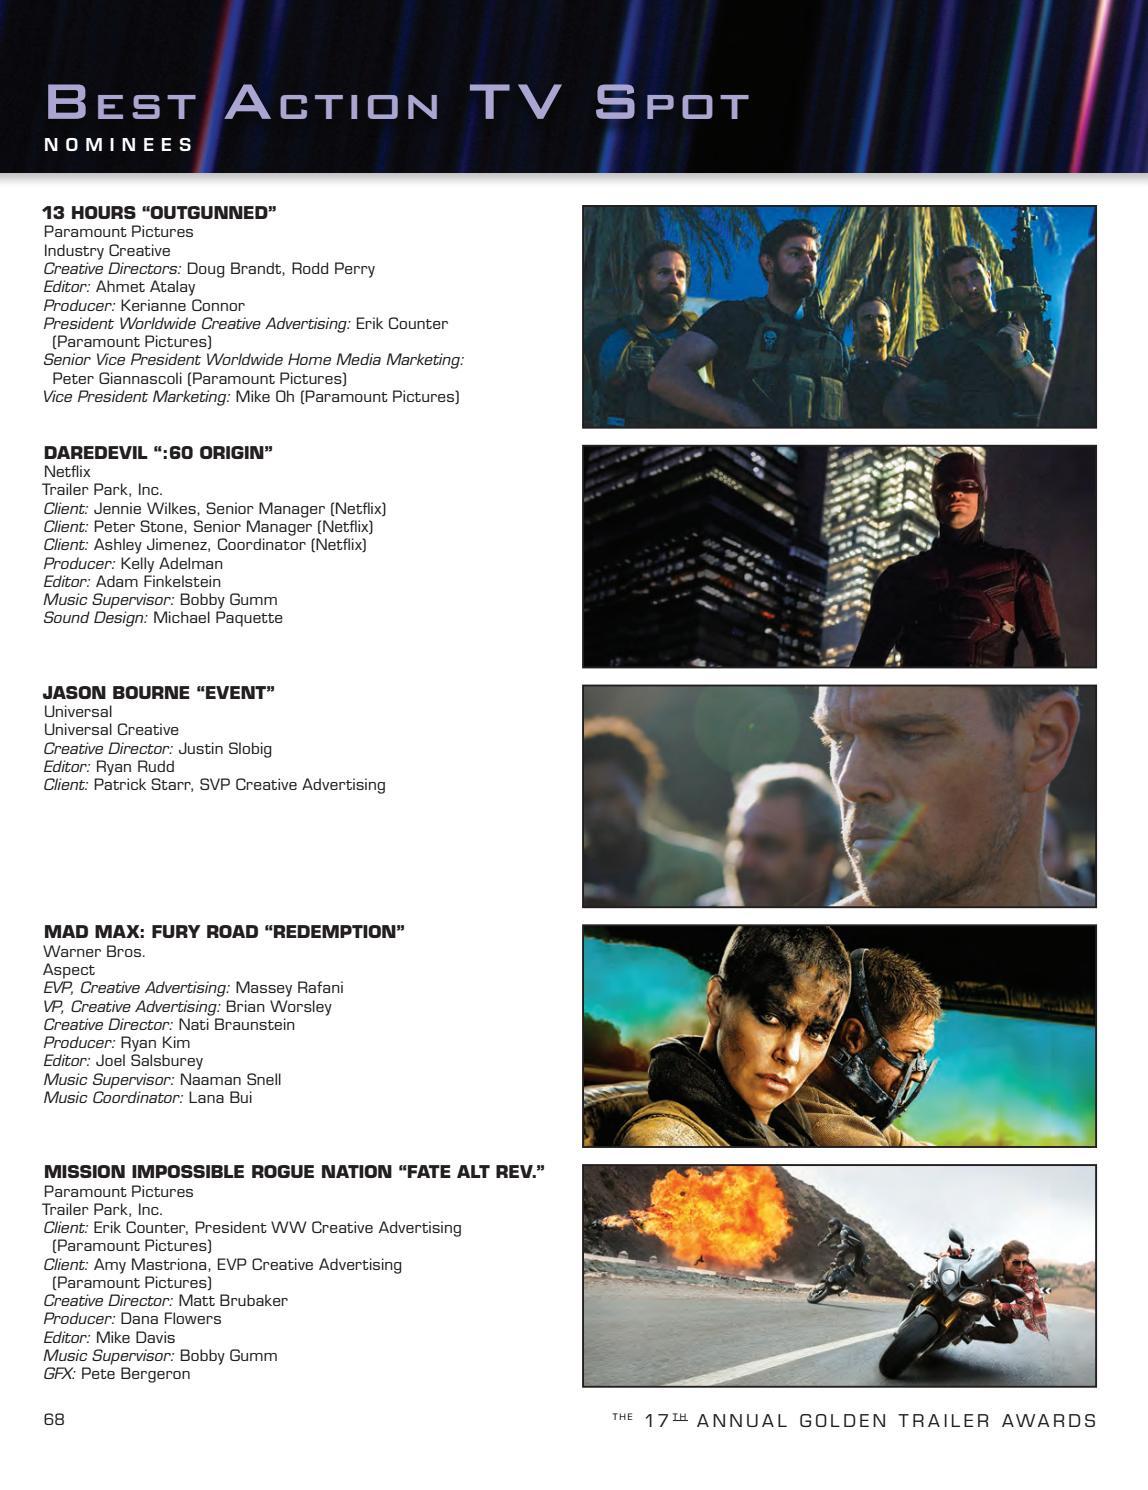 17th Annual Golden Trailer Awards Program Book (2016) by Trailer